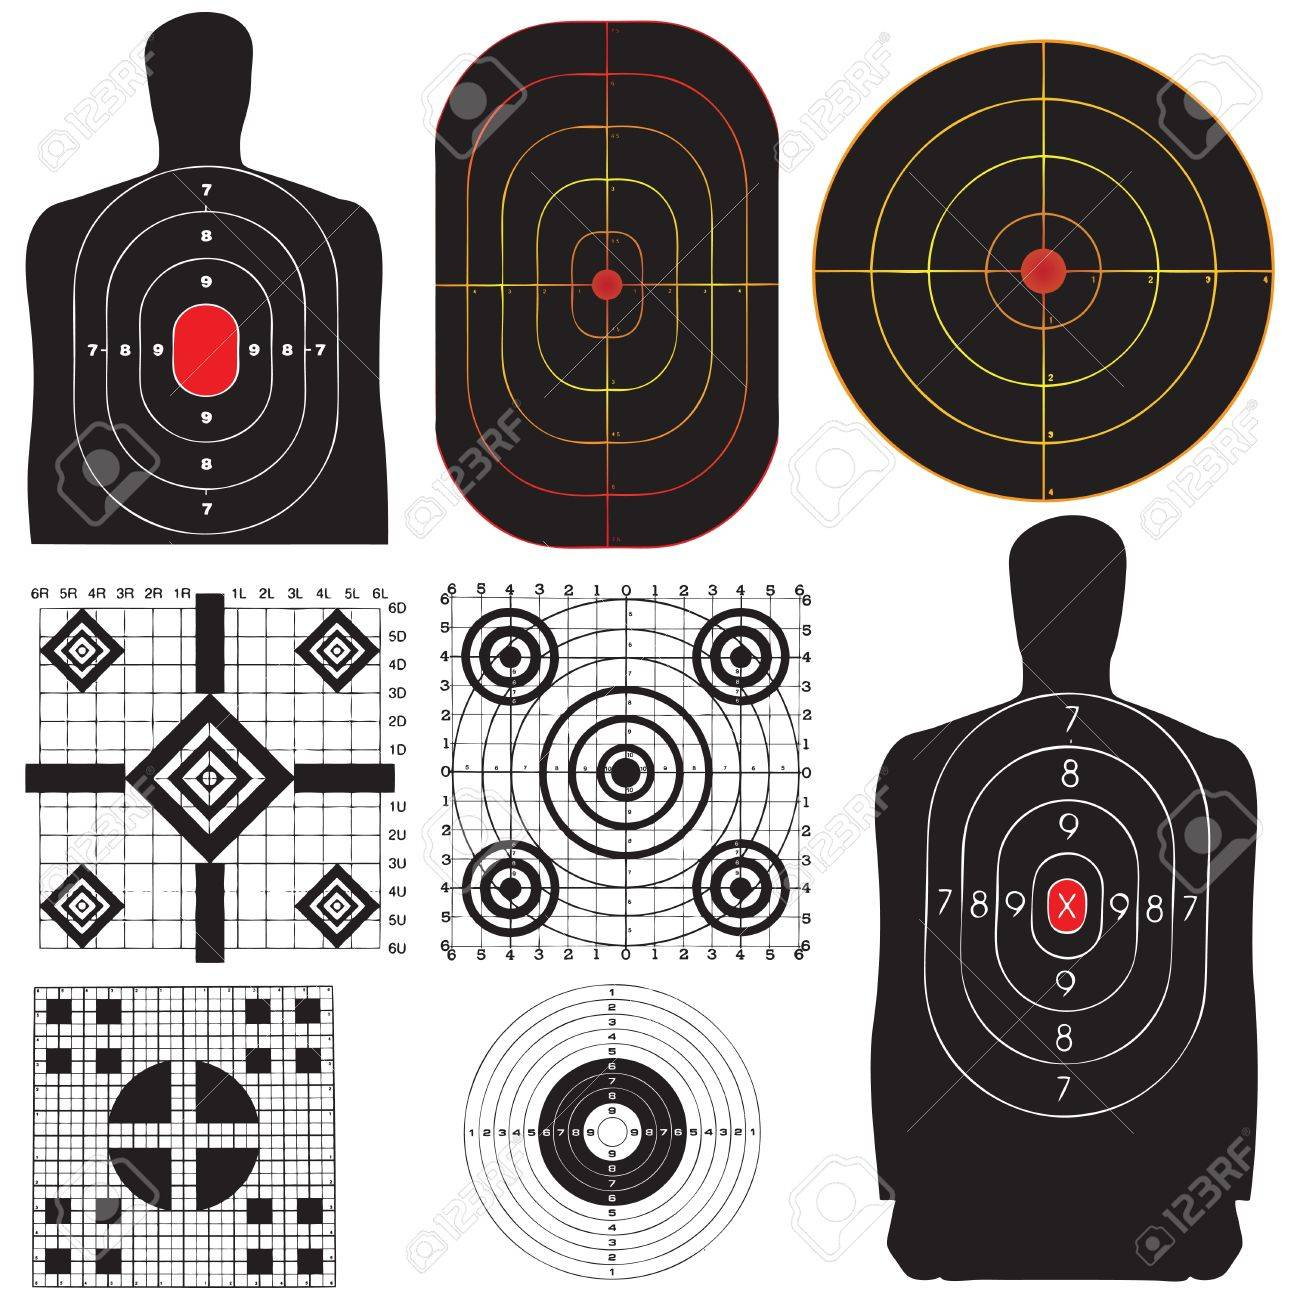 A professional set targets for training. Vector illustration. - 20920944